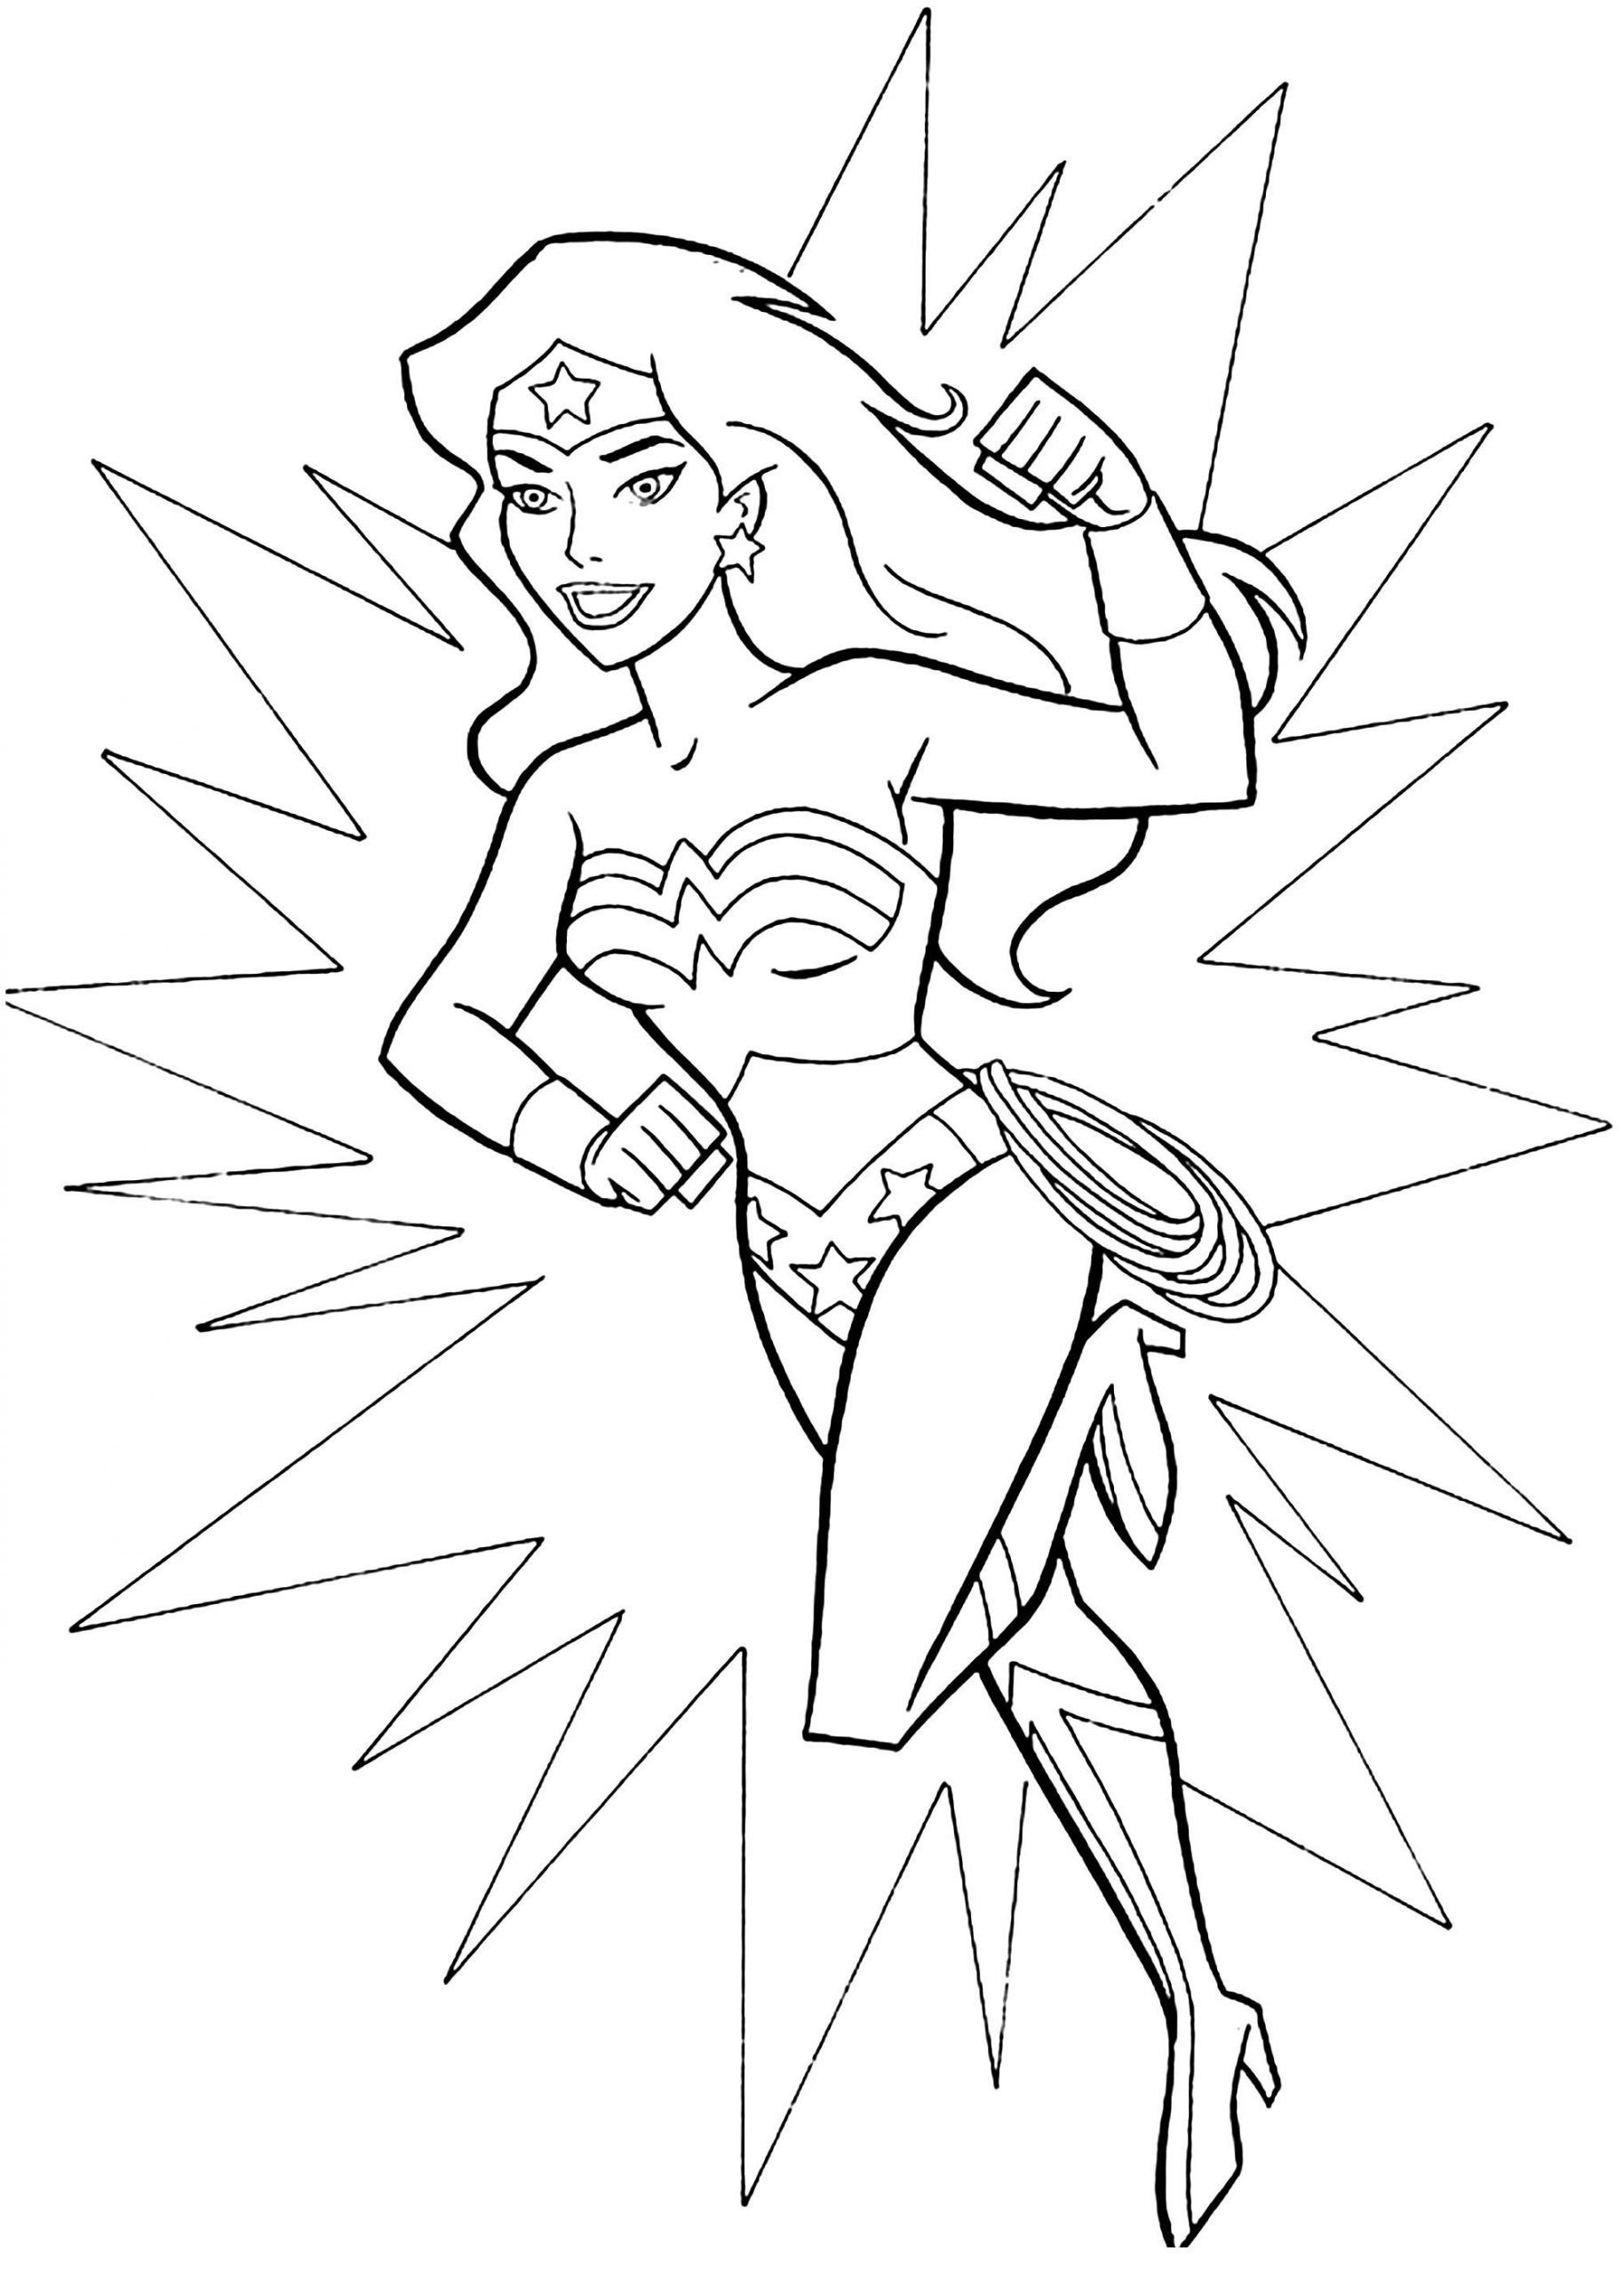 Wonder Woman Coloring Pages Wonder Woman Wonder Woman Kids Coloring Pages Minion Coloring Pages Coloring Pages Free Kids Coloring Pages